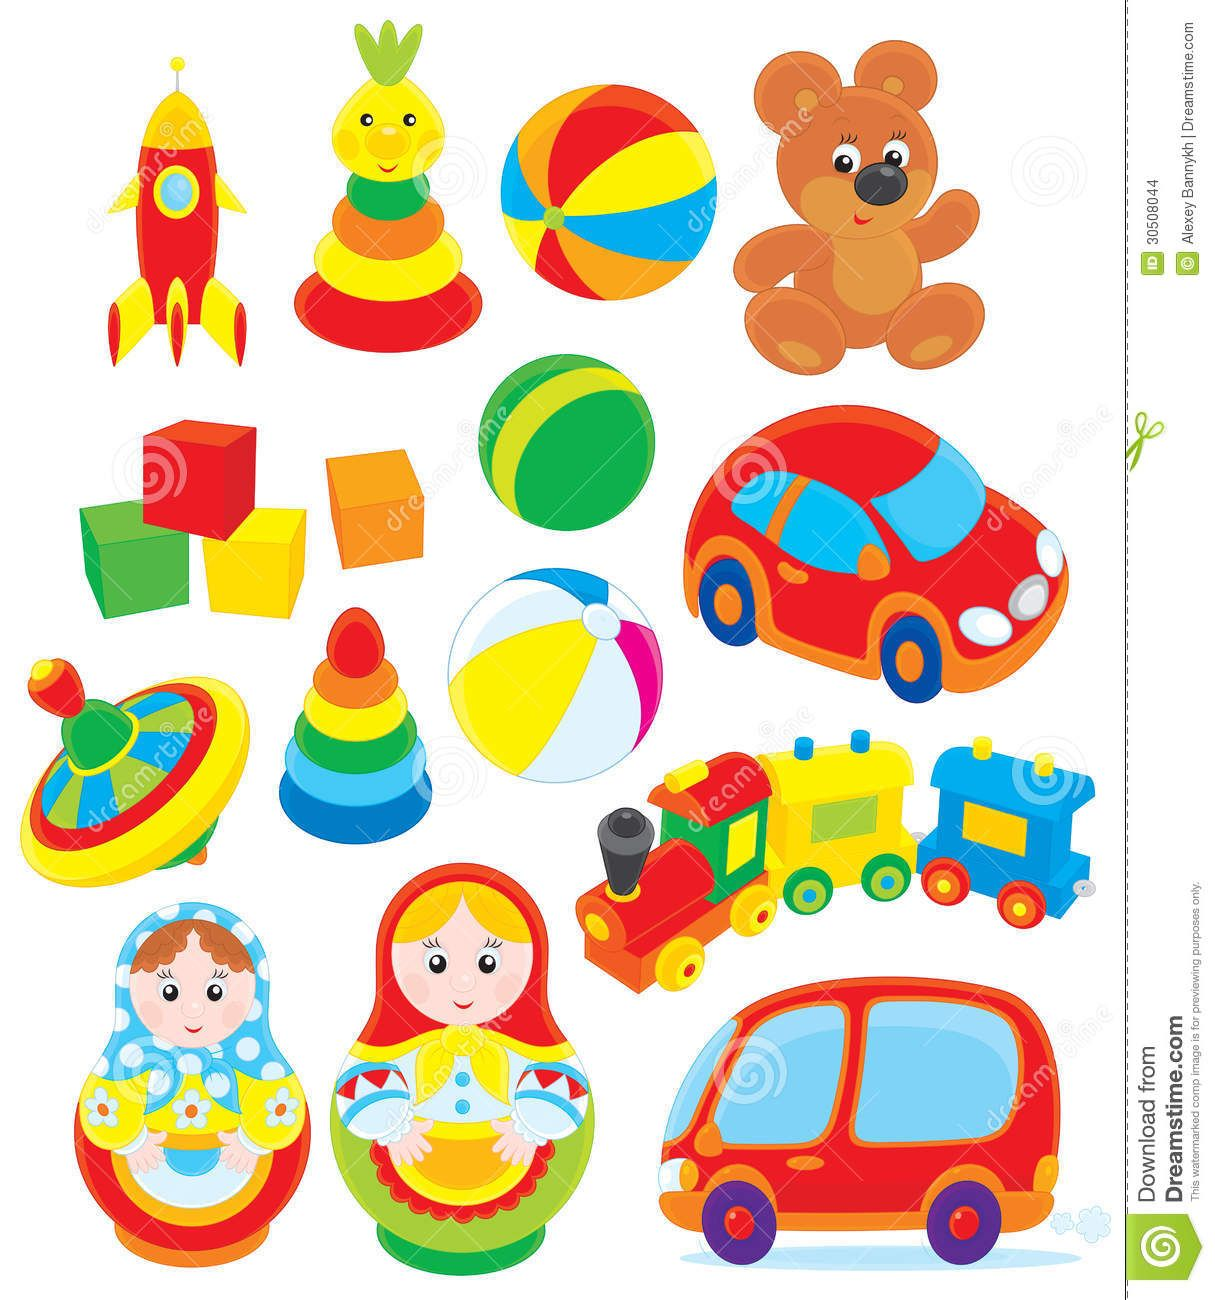 toys clipart - photo #30